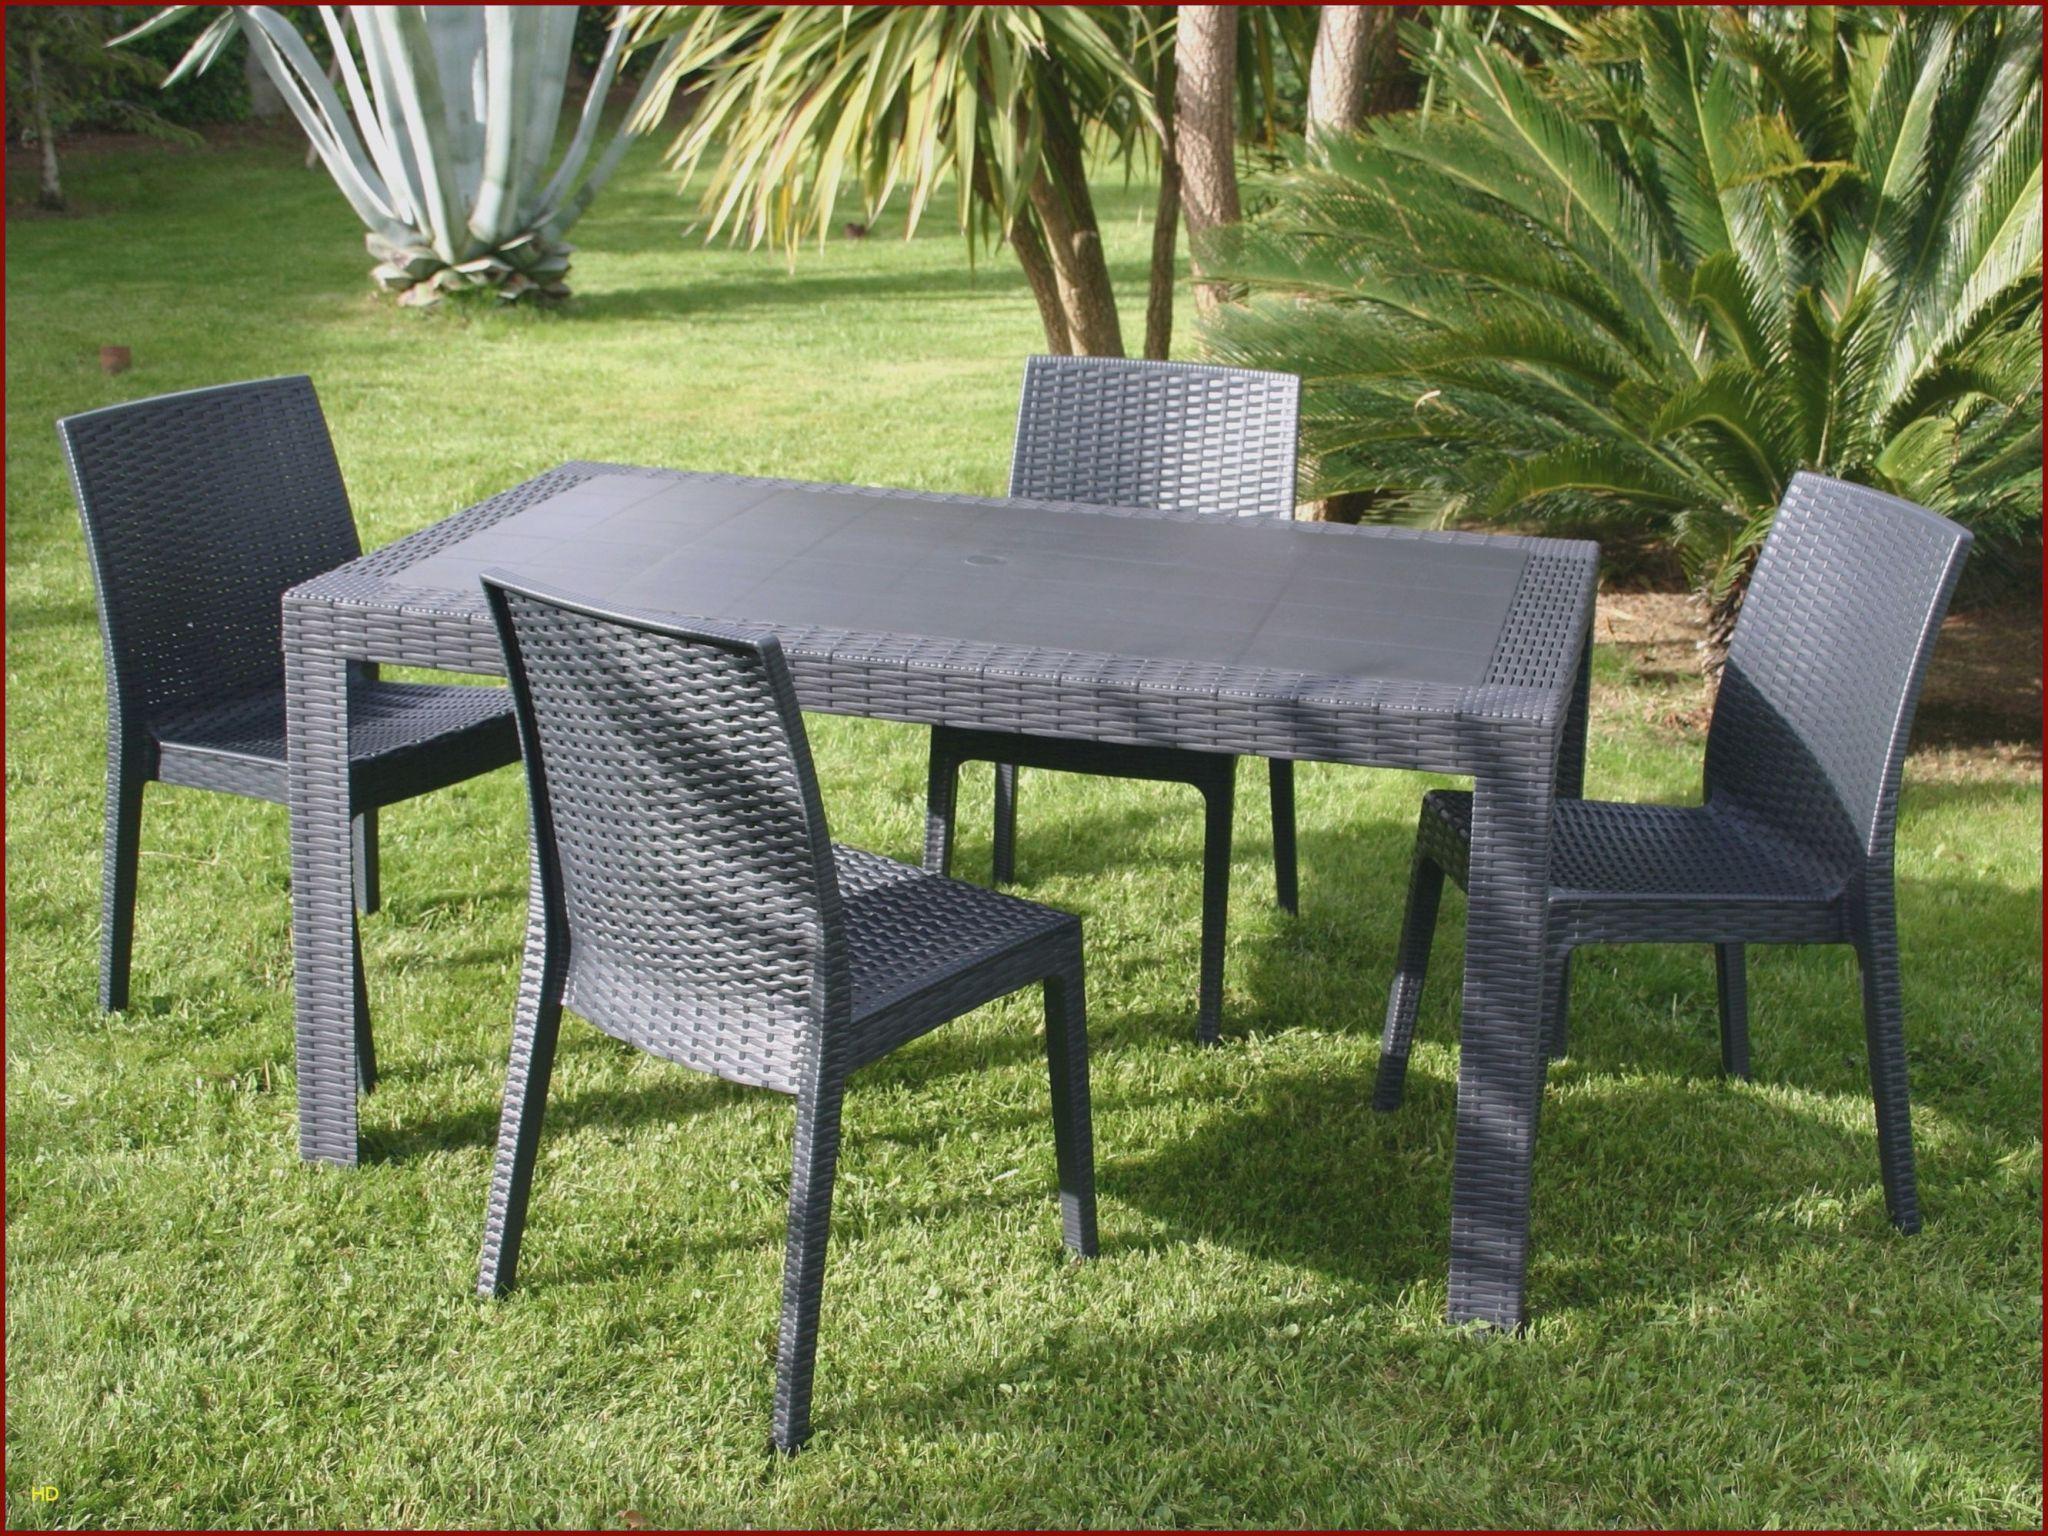 Table Exterieur Leroy Merlin Élégant Chaises Luxe Chaise Ice 0d Table Jardin Resine Lovely